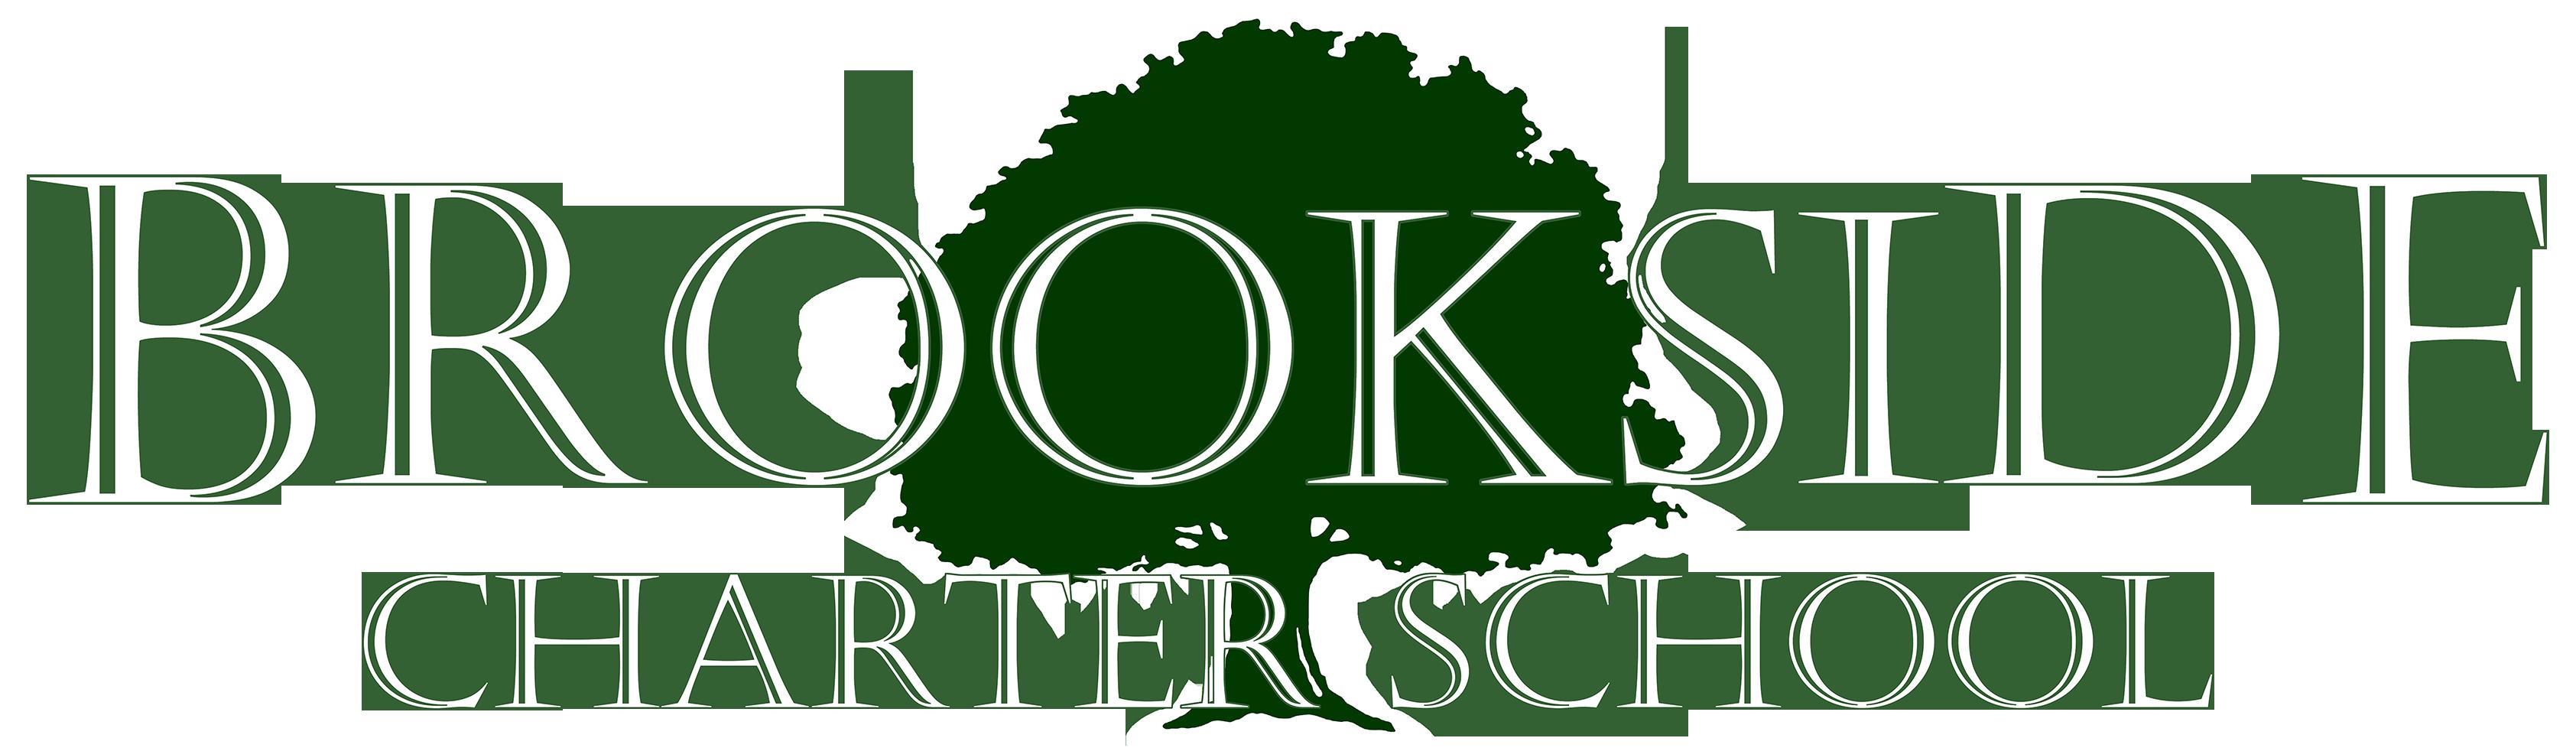 Curriculum clipart charter schools. Brookside school in kansas